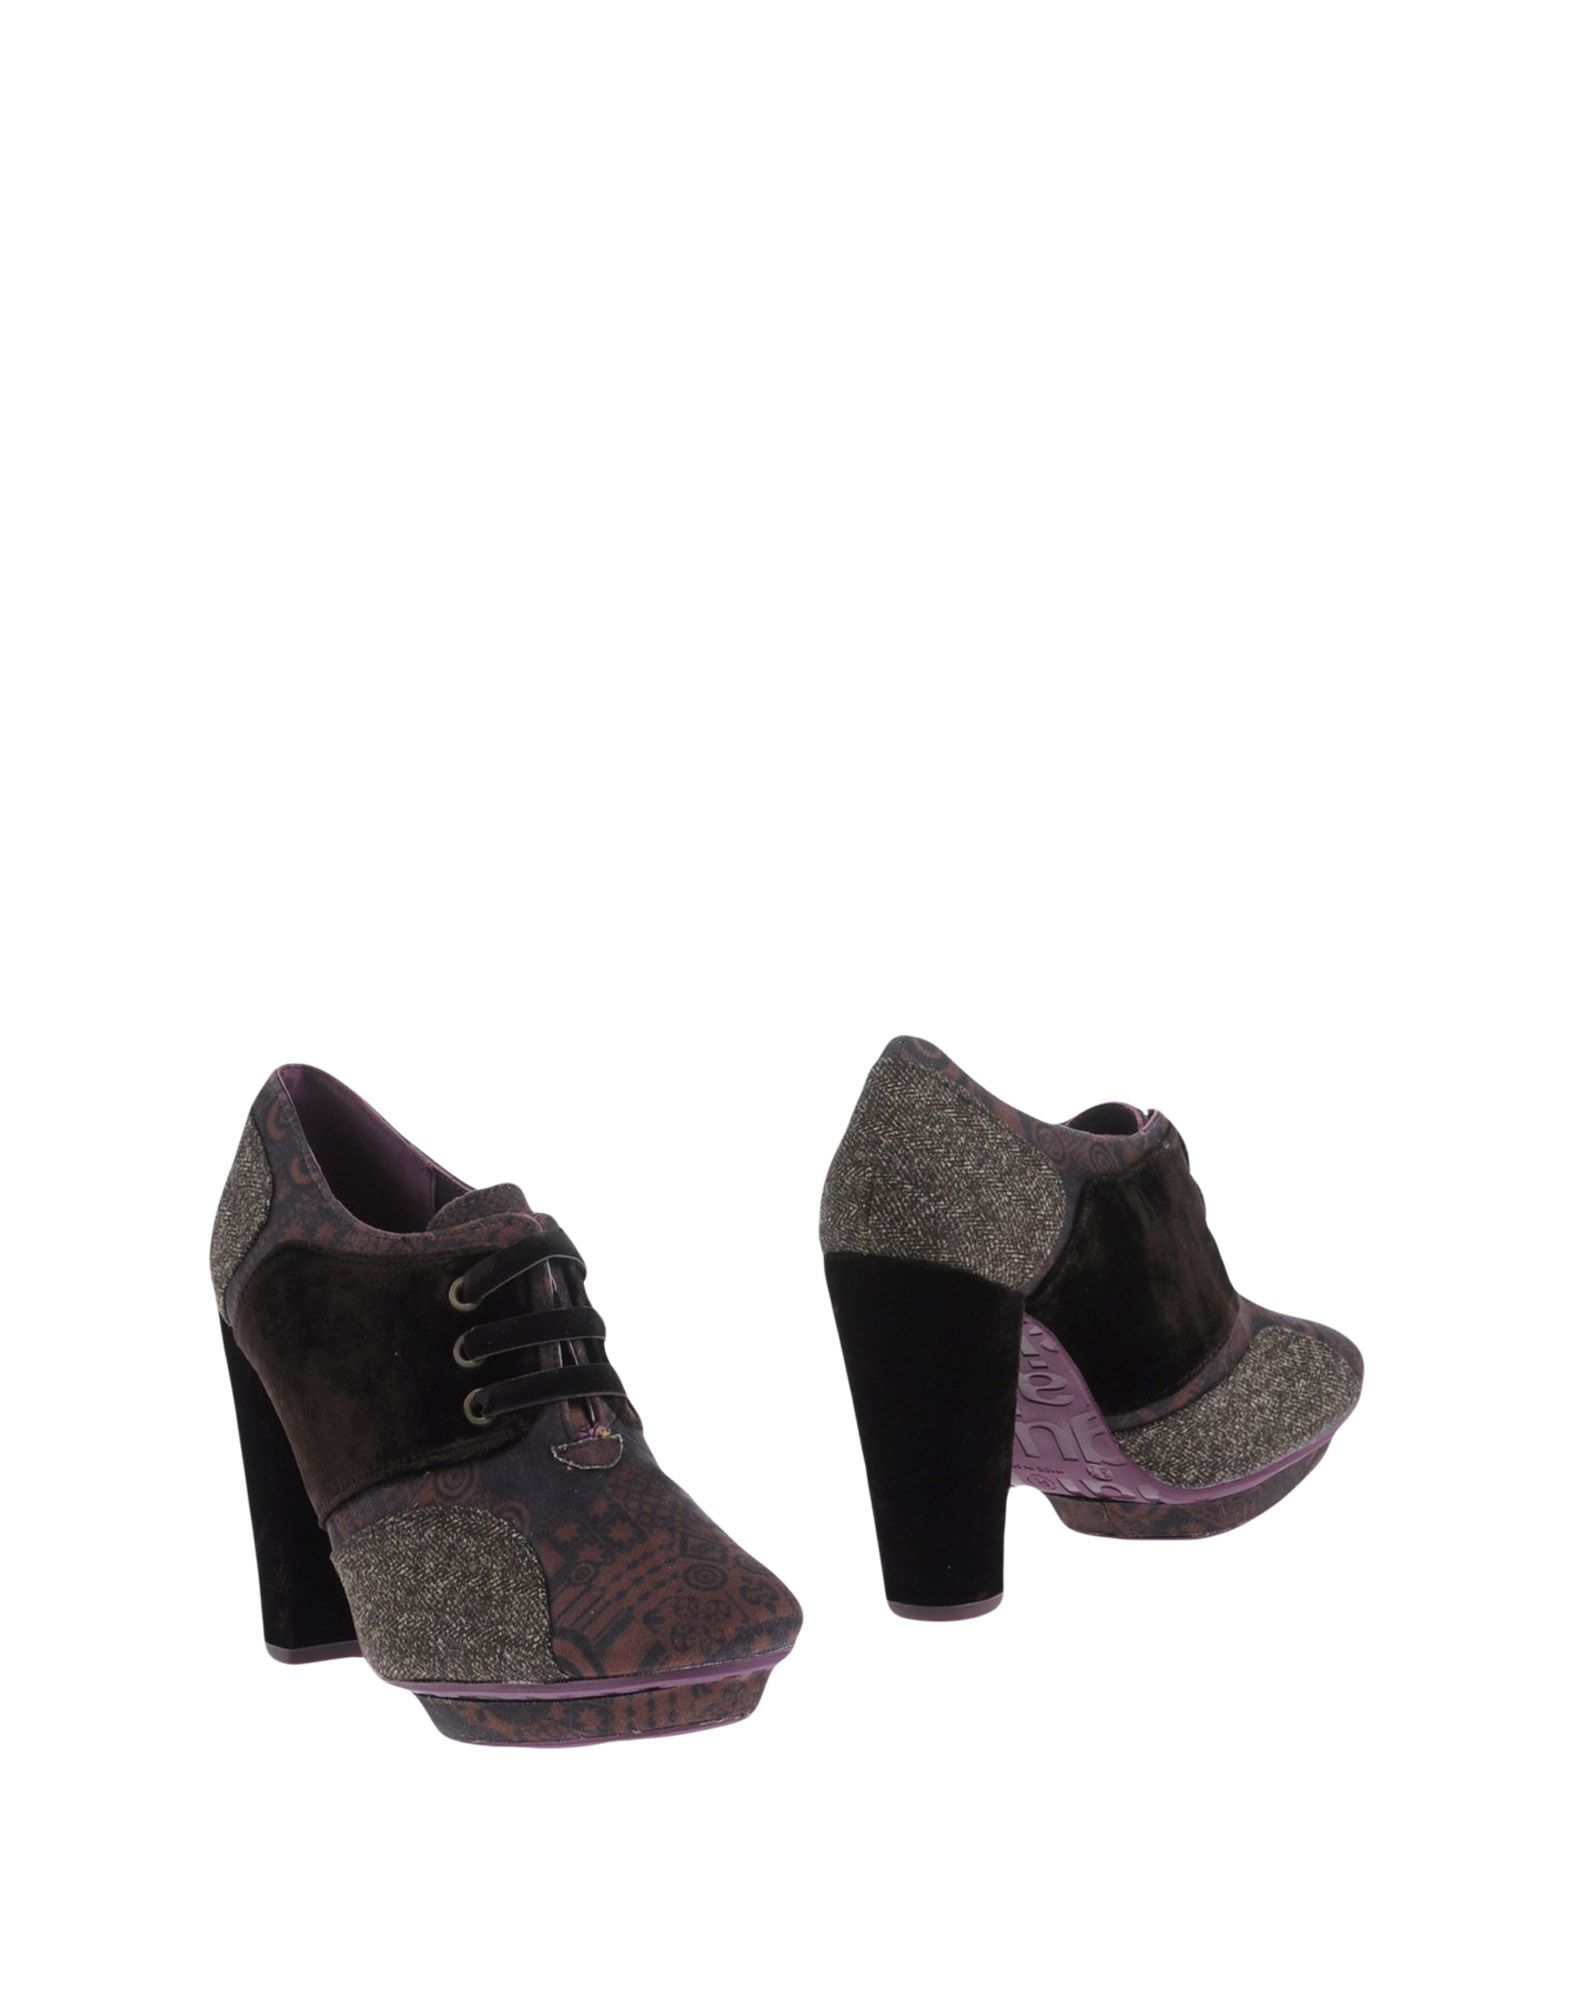 Moda Stivaletti Desigual Donna - 11181425CS